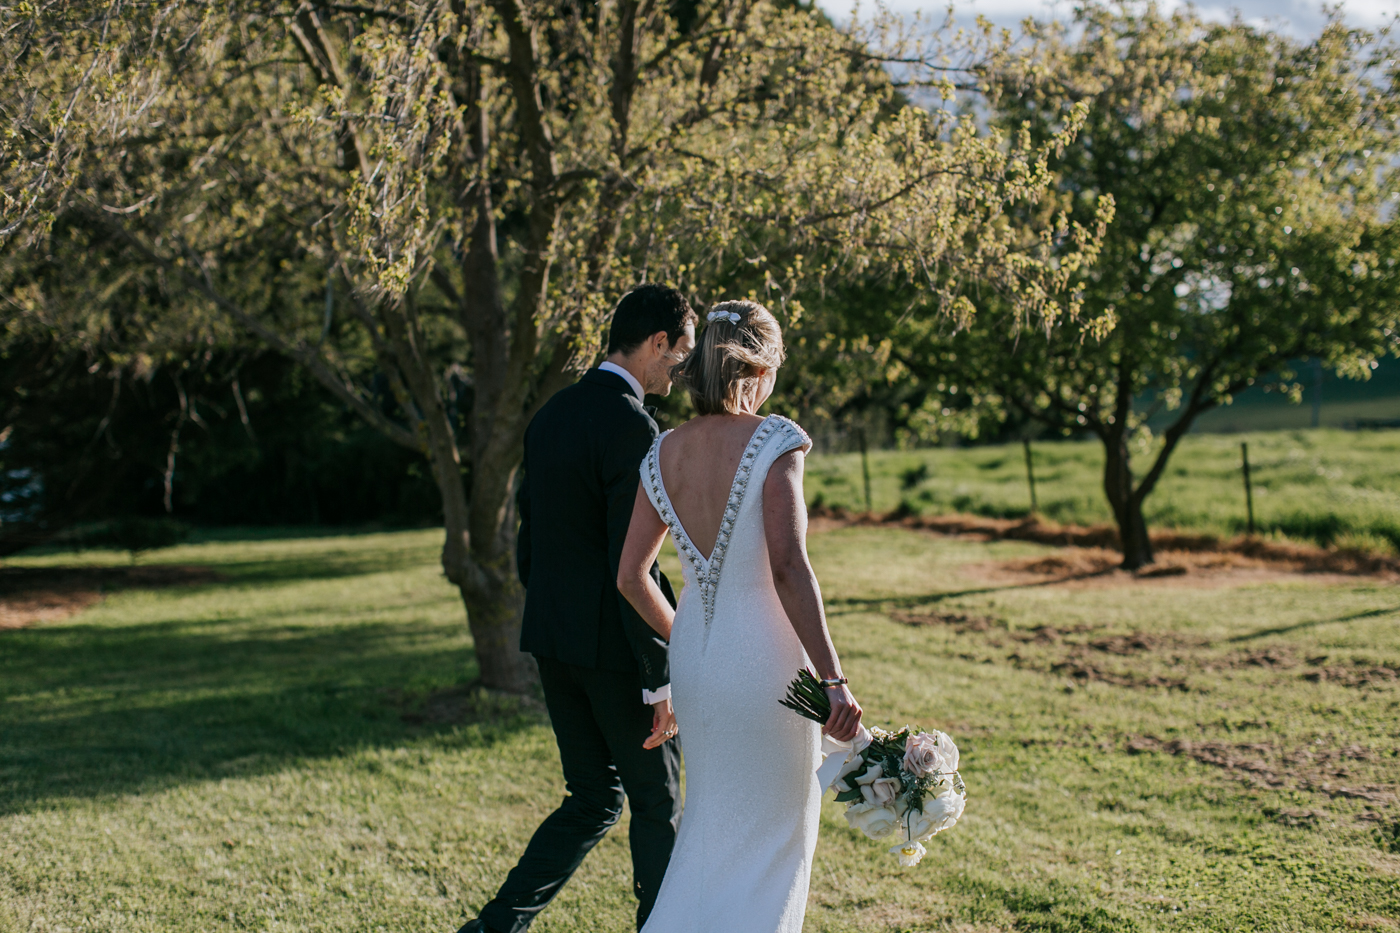 Bridget & James - Orange Country Wedding - Samantha Heather Photography-133.jpg